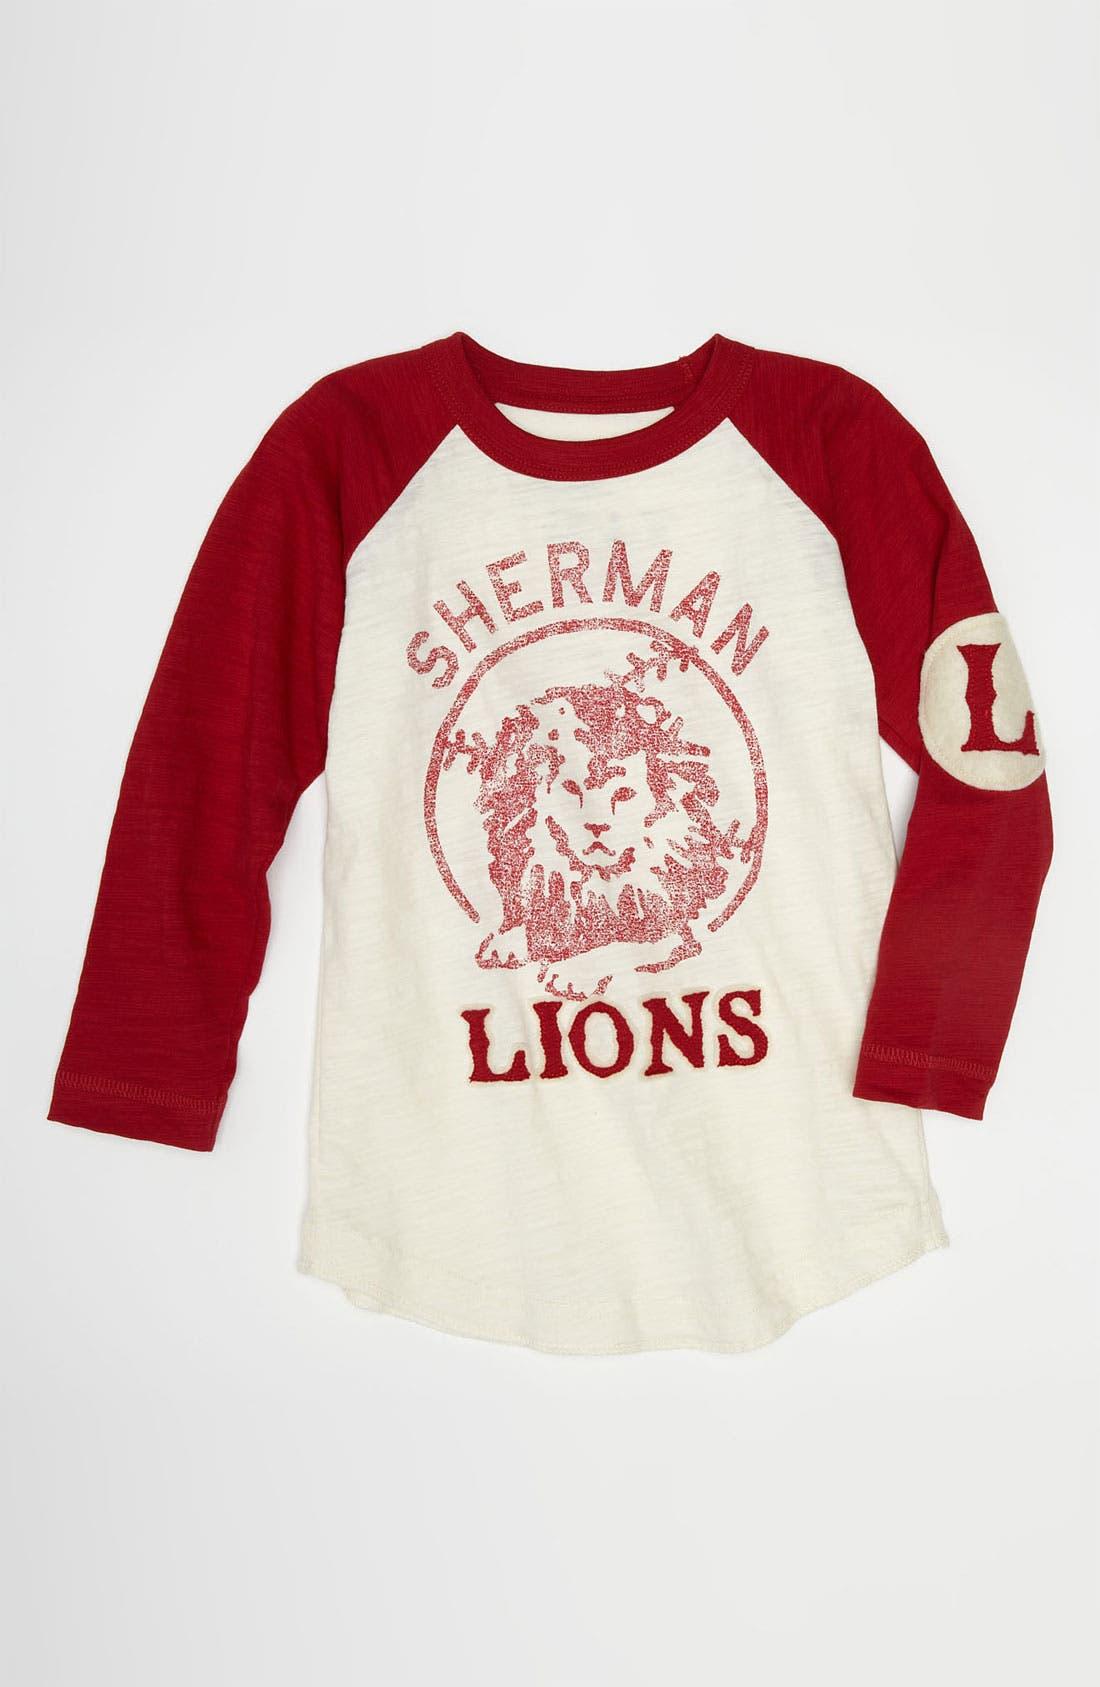 Main Image - Peek 'Sherman Lions' T-Shirt (Toddler, Little Boys & Big Boys)